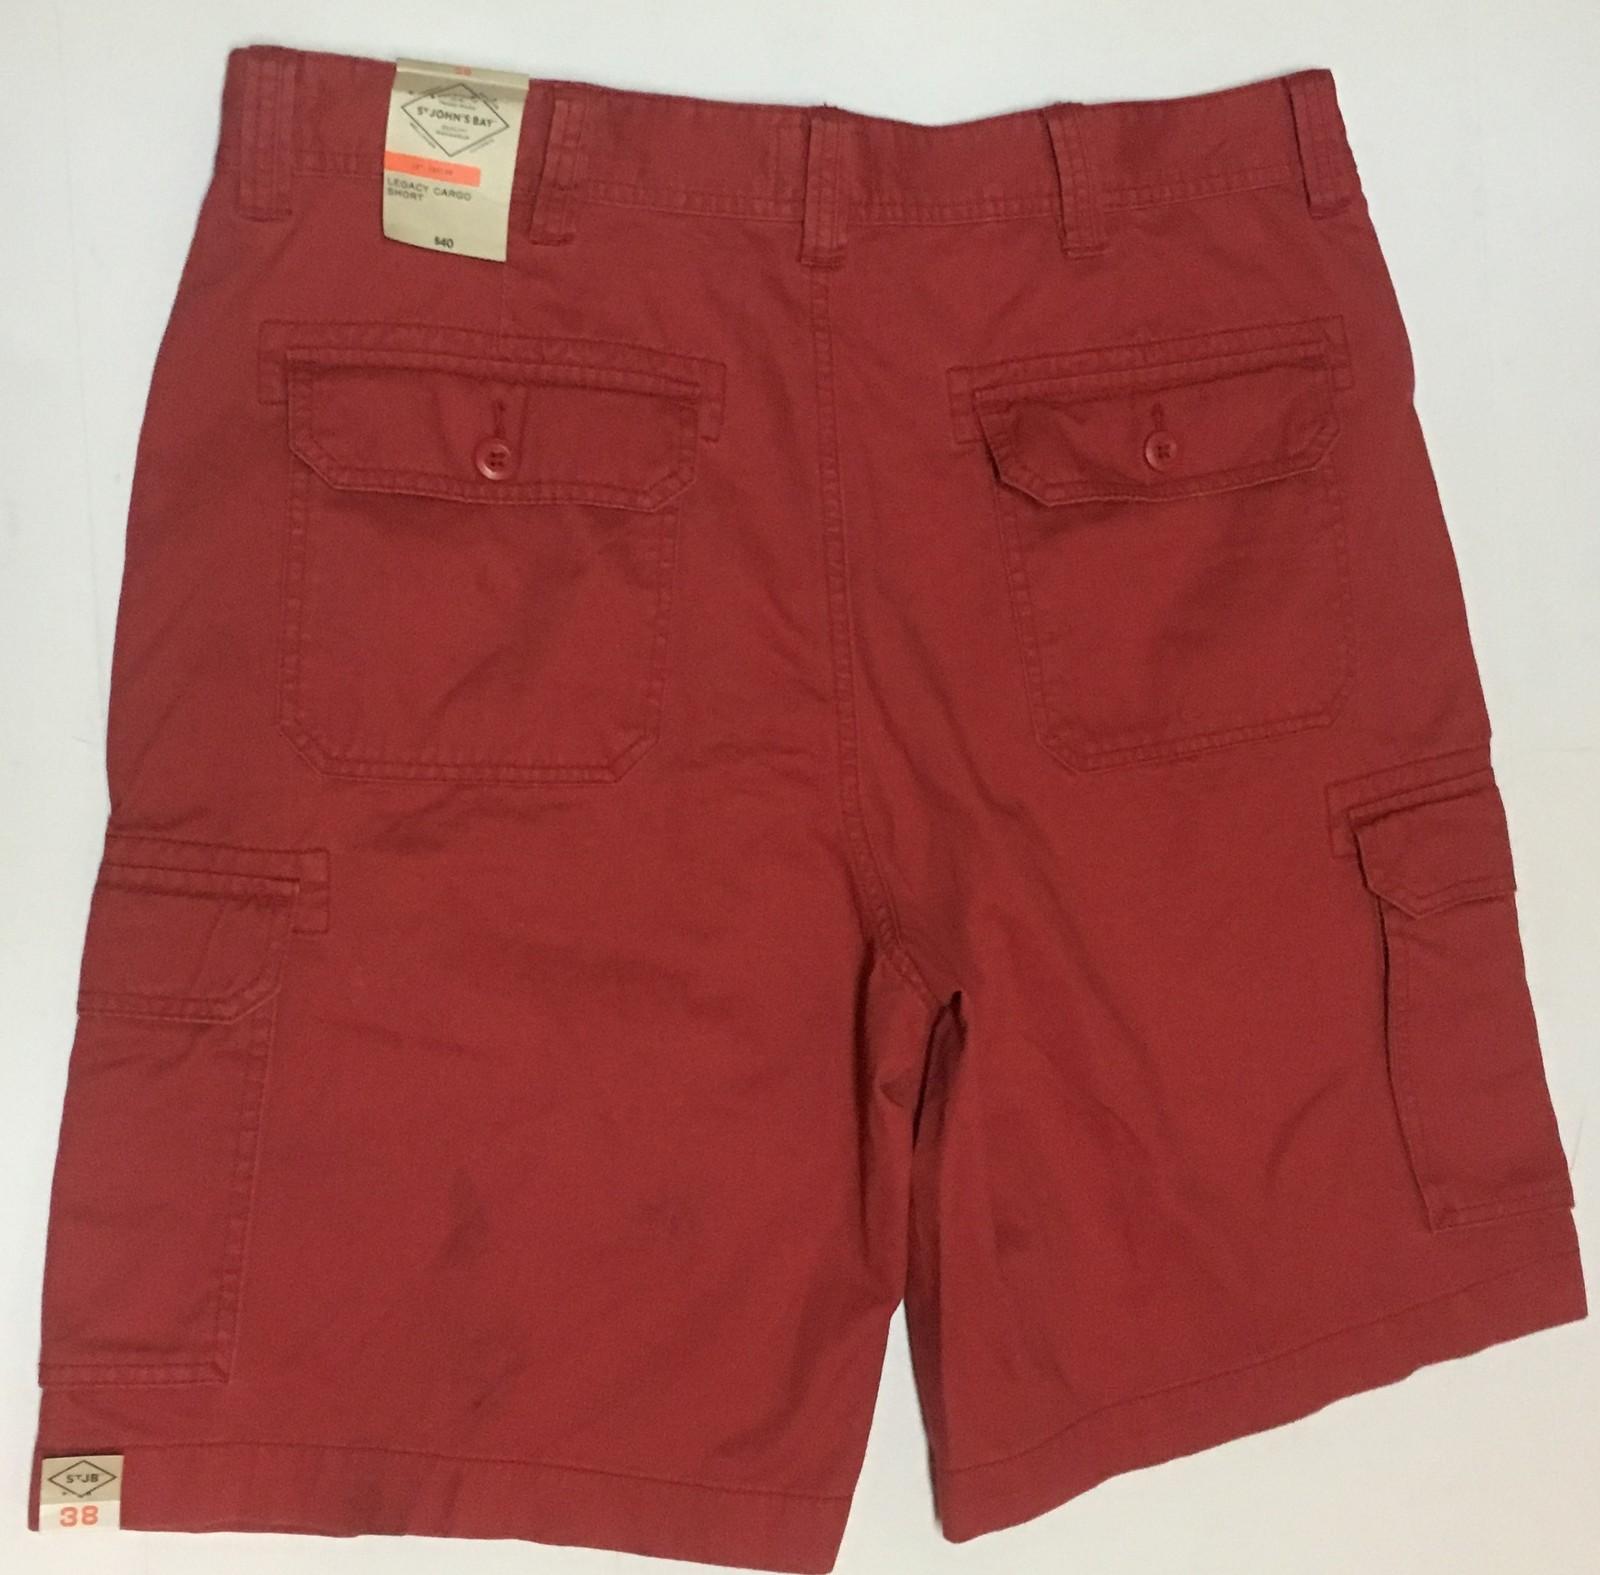 St. John's Bay Men's Cargo Shorts Coral Red Sz 38 NWT